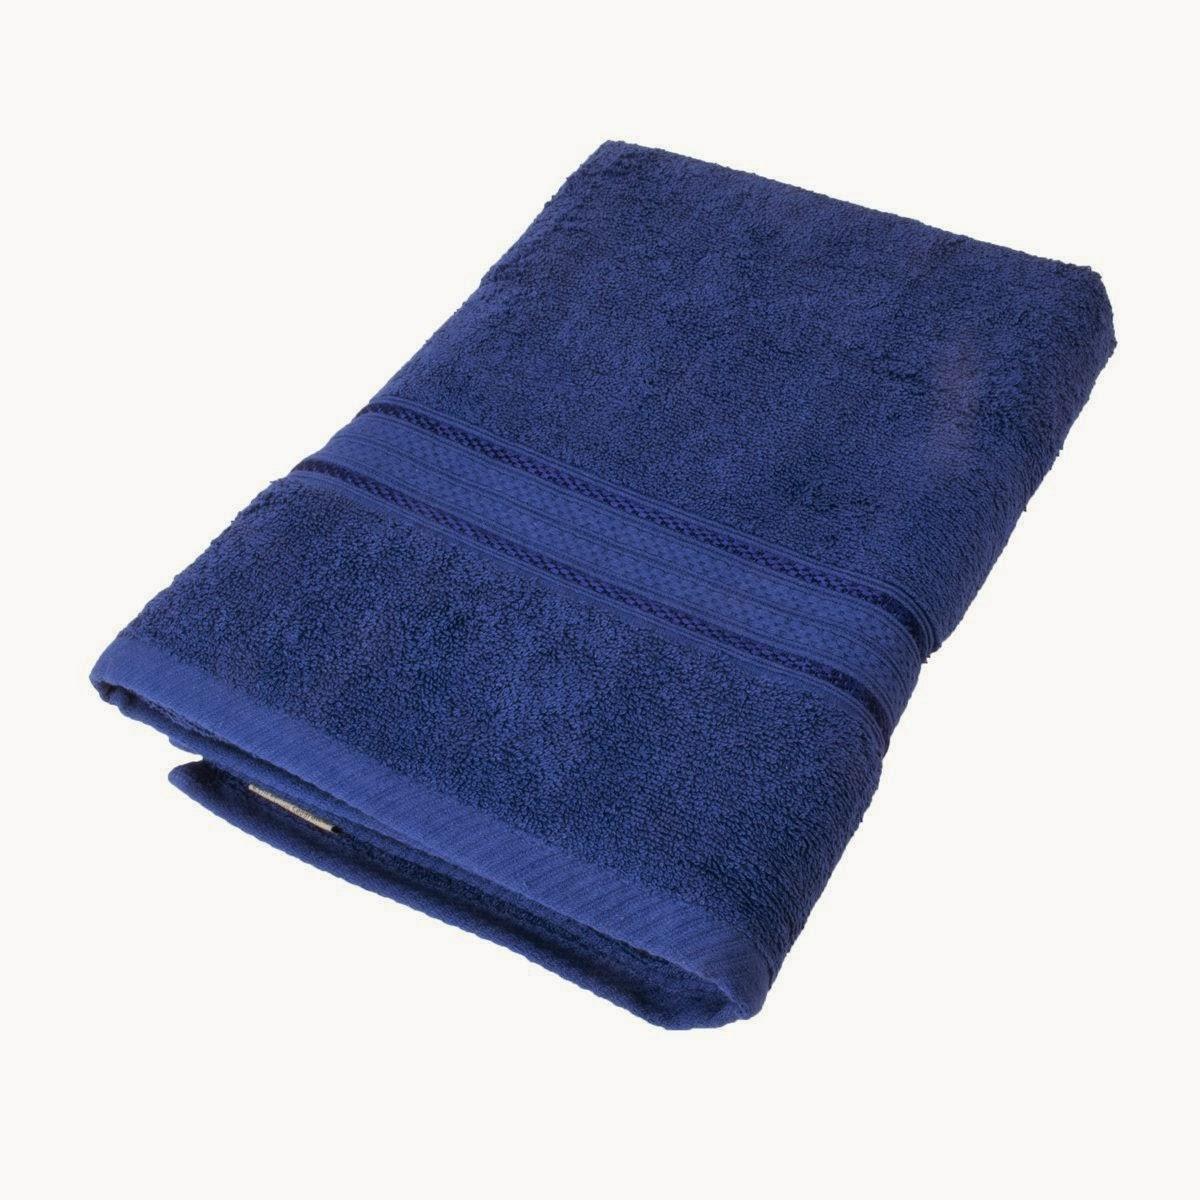 Big Bazaar Premium Bath Towel 70cm x 140 cm for Rs 279